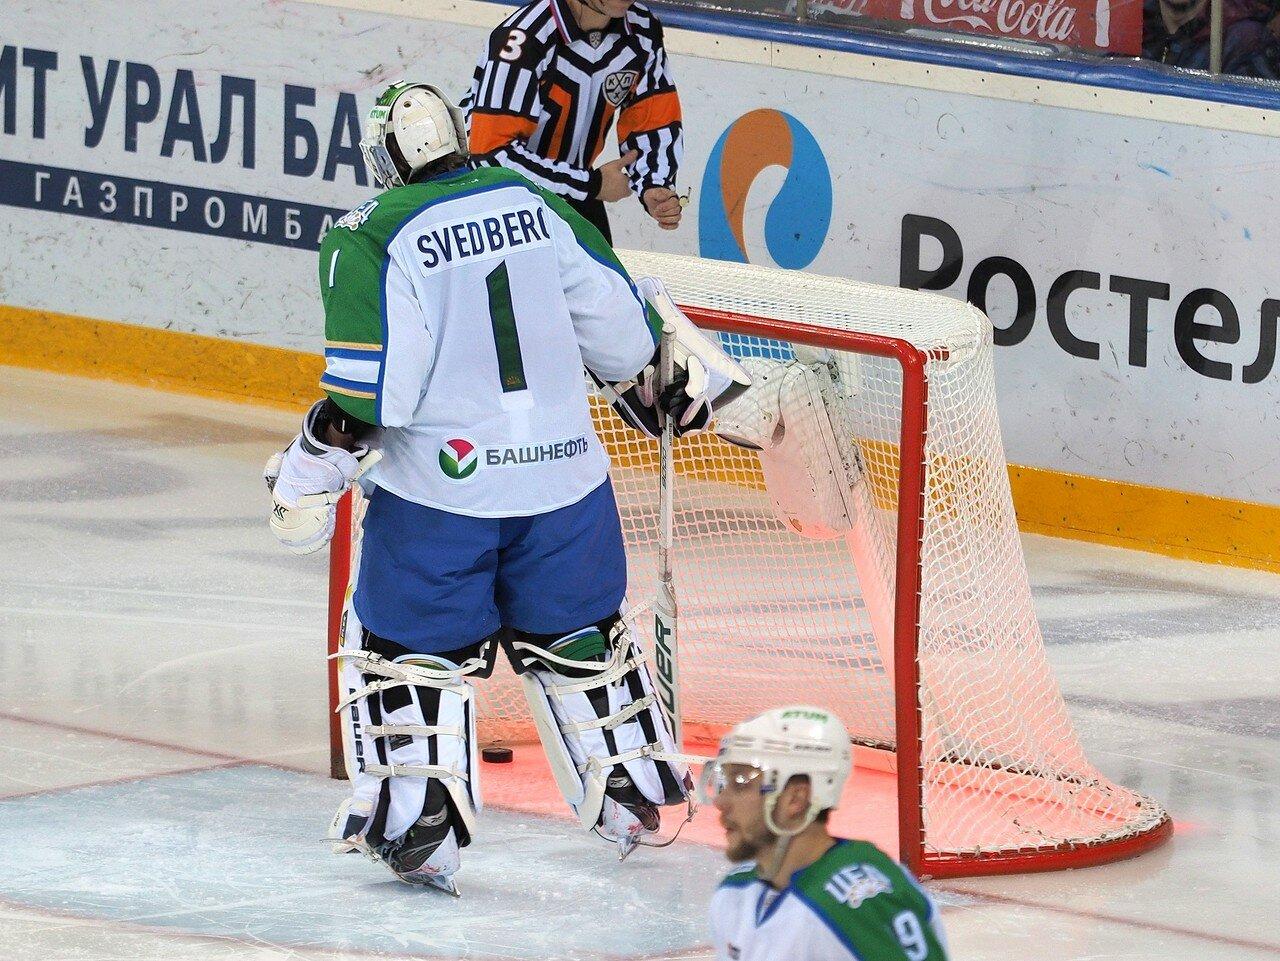 13Плей-офф 2016 Восток Финал Металлург - Салават Юлаев 25.03.2016